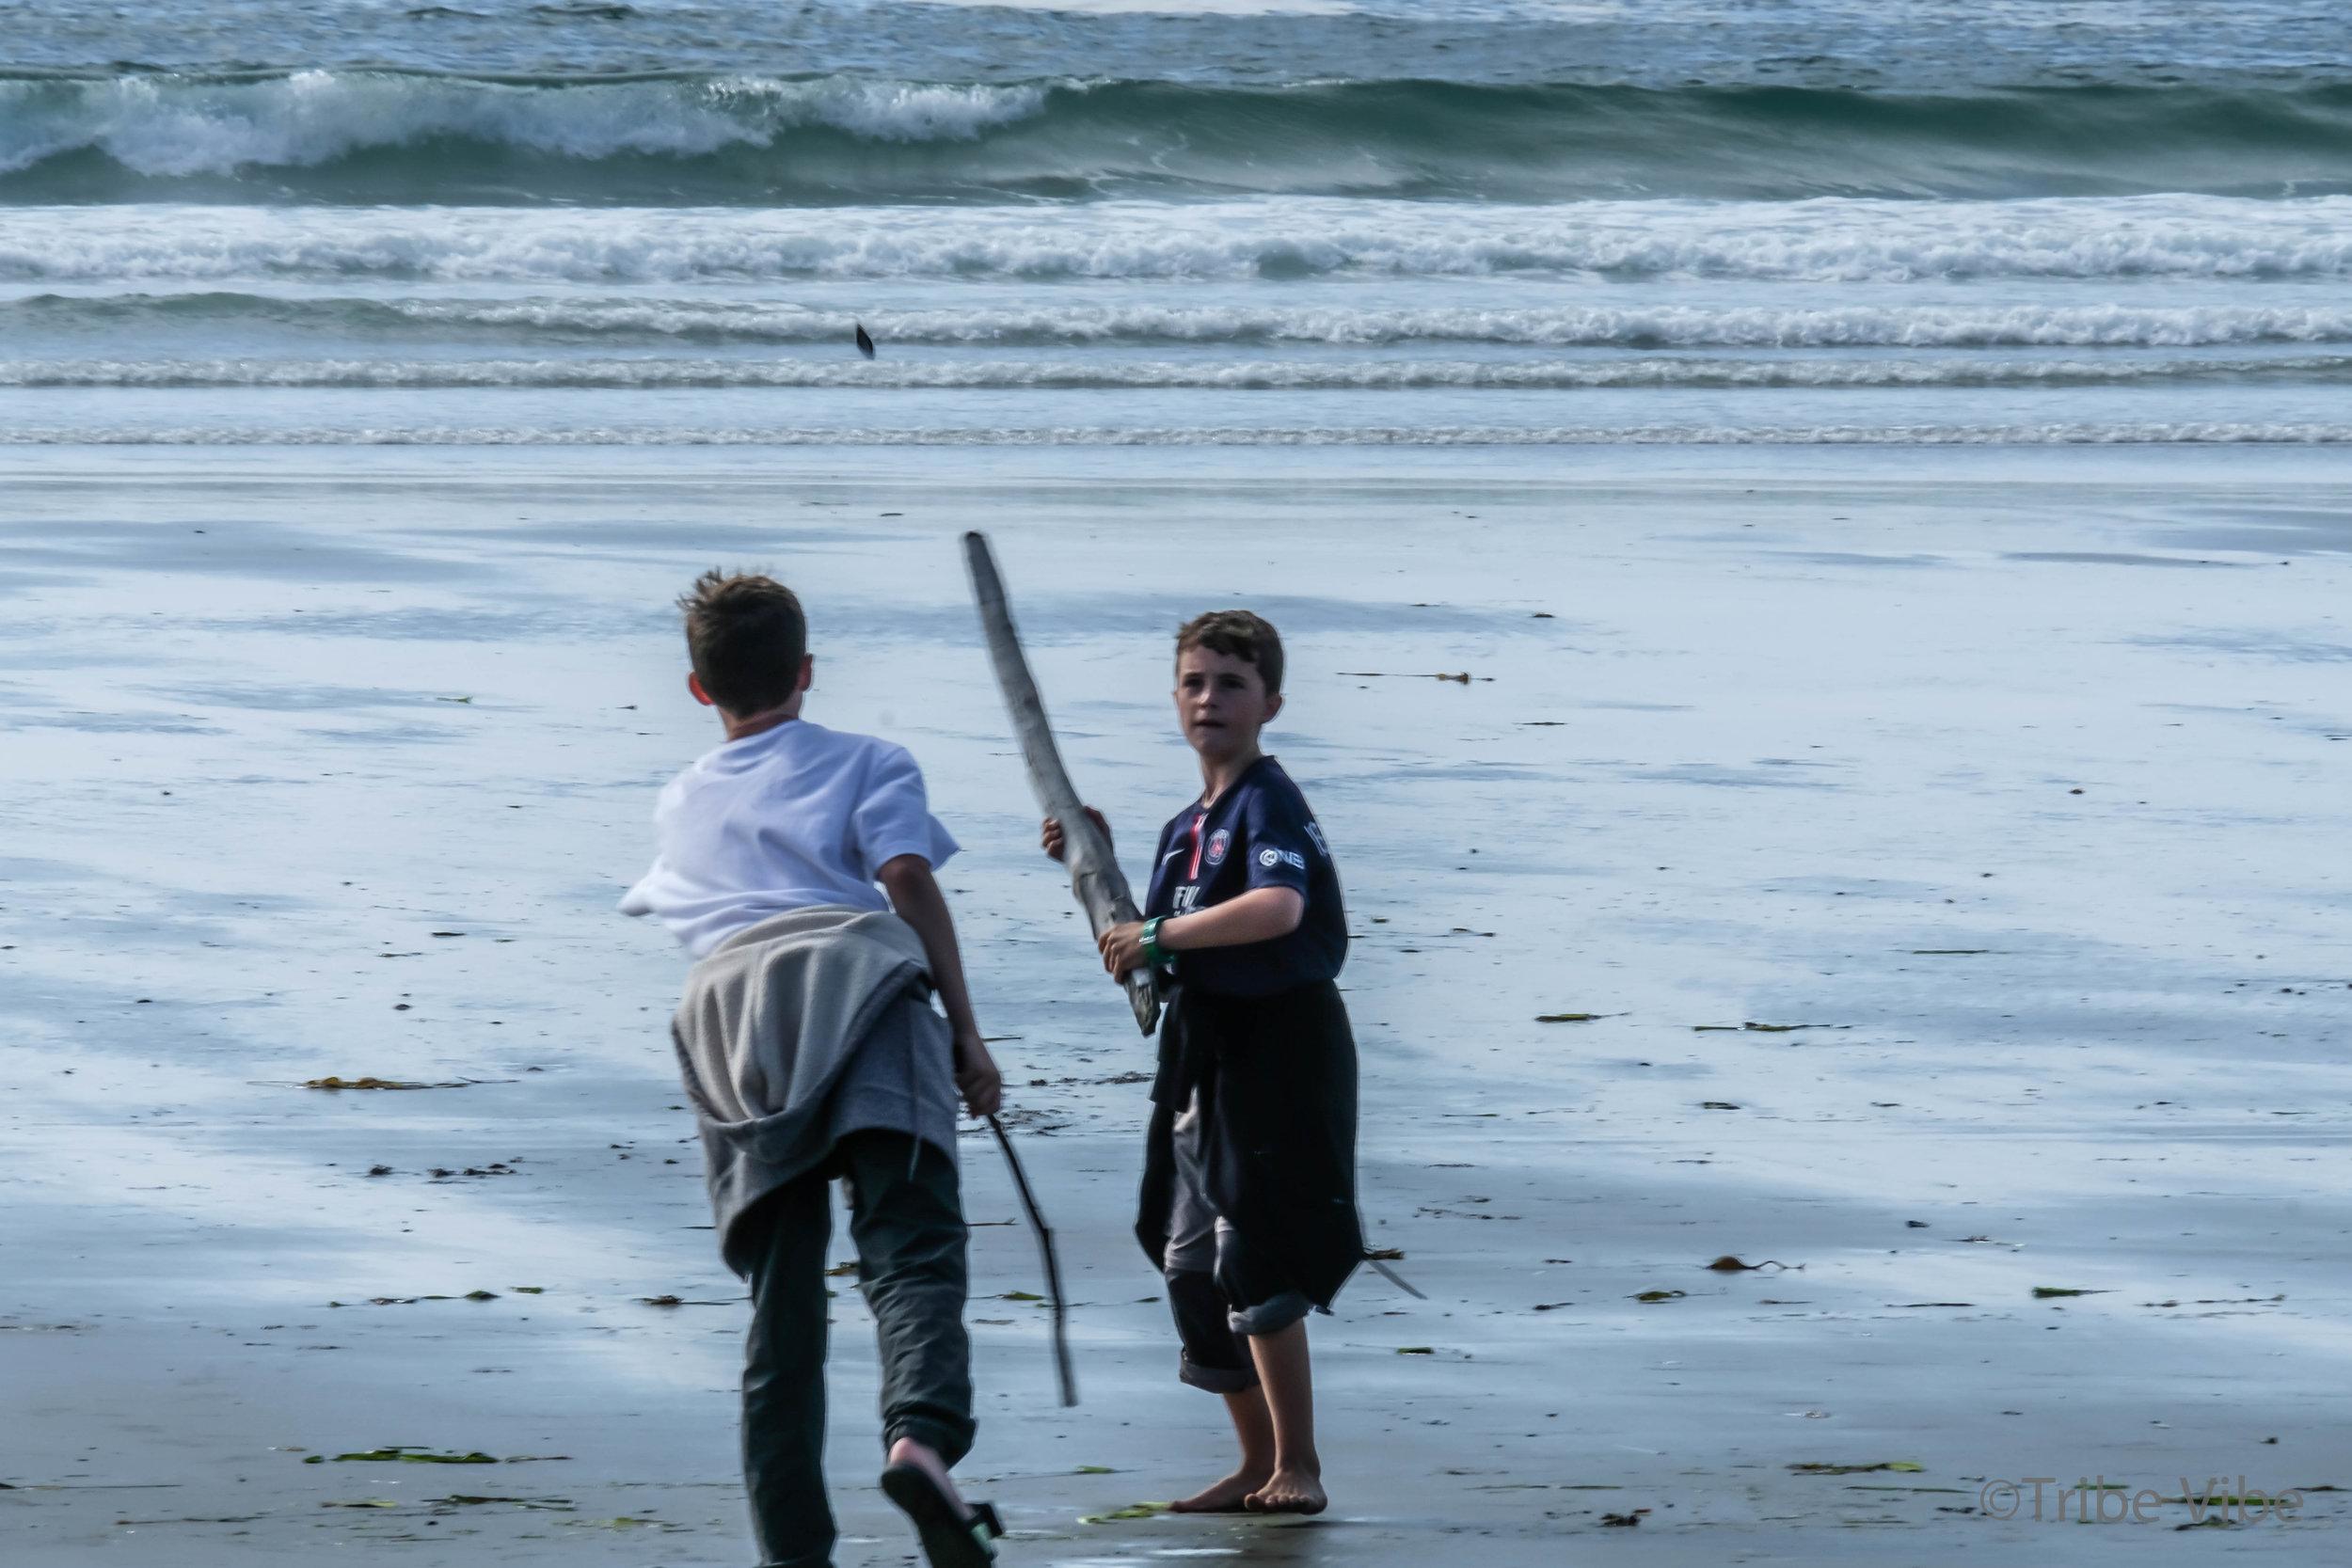 tofino surfing cox bay.24.jpg